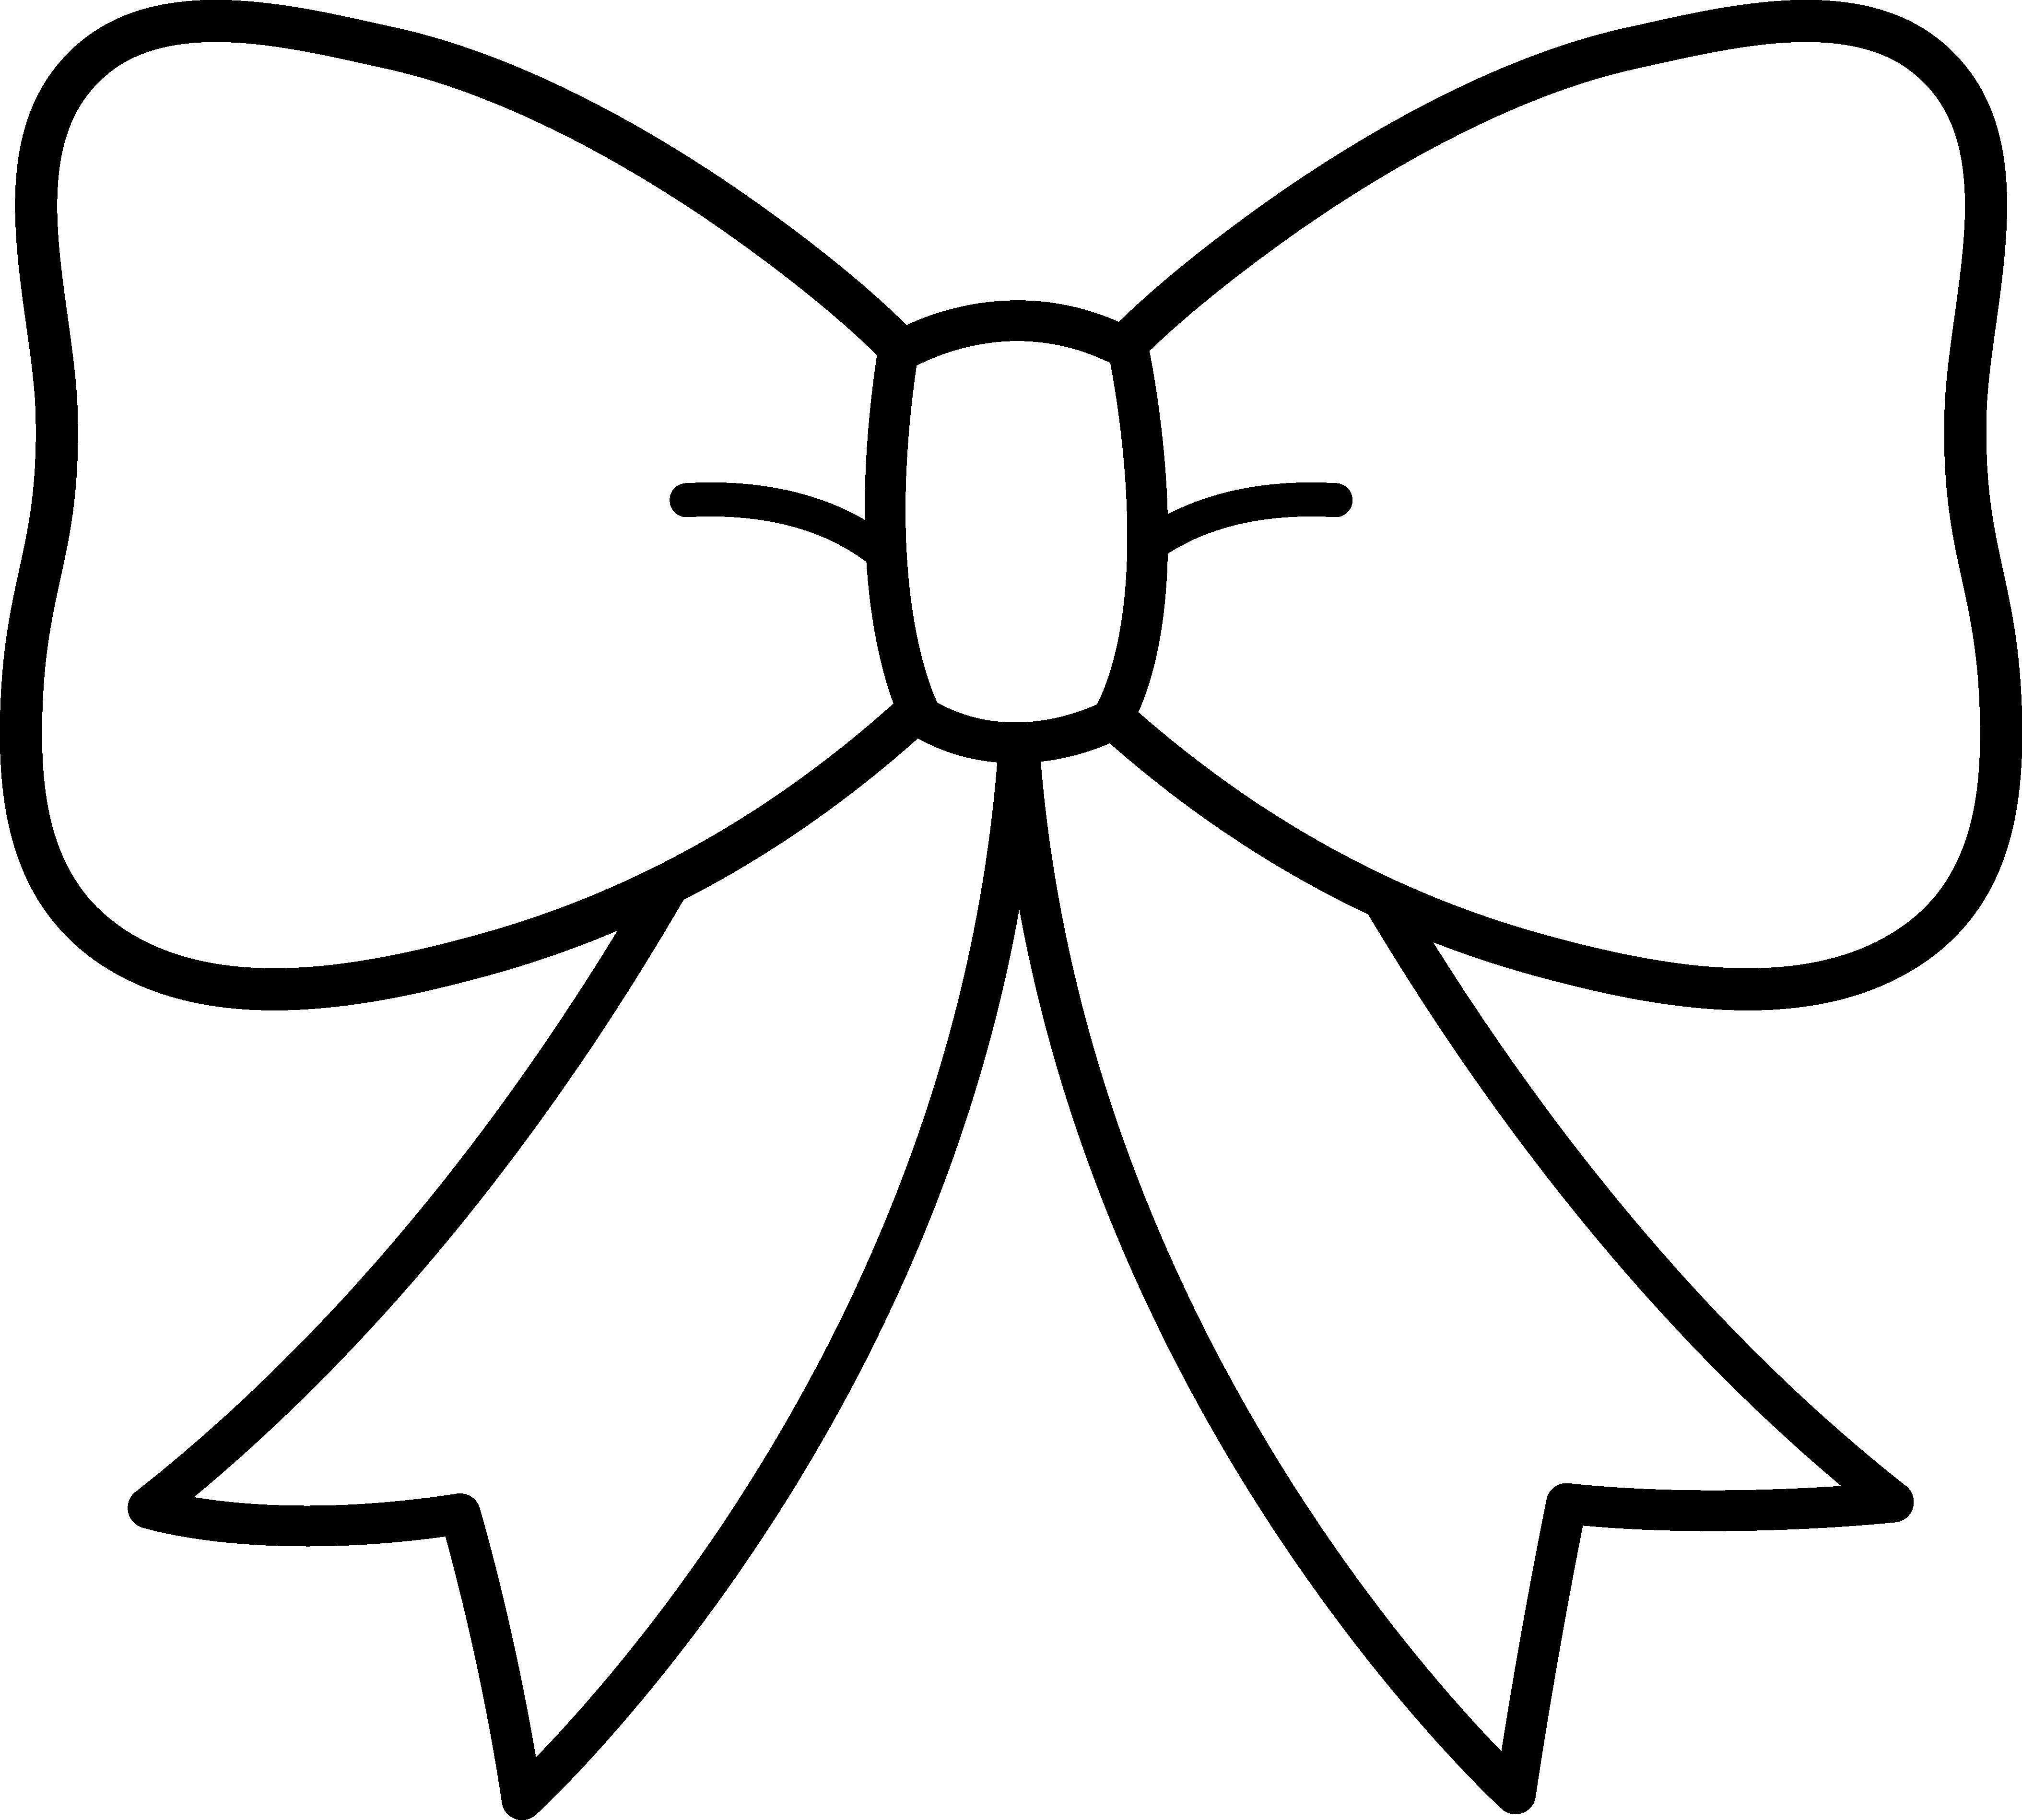 4216x3795 Ribbon Clipart Black And White